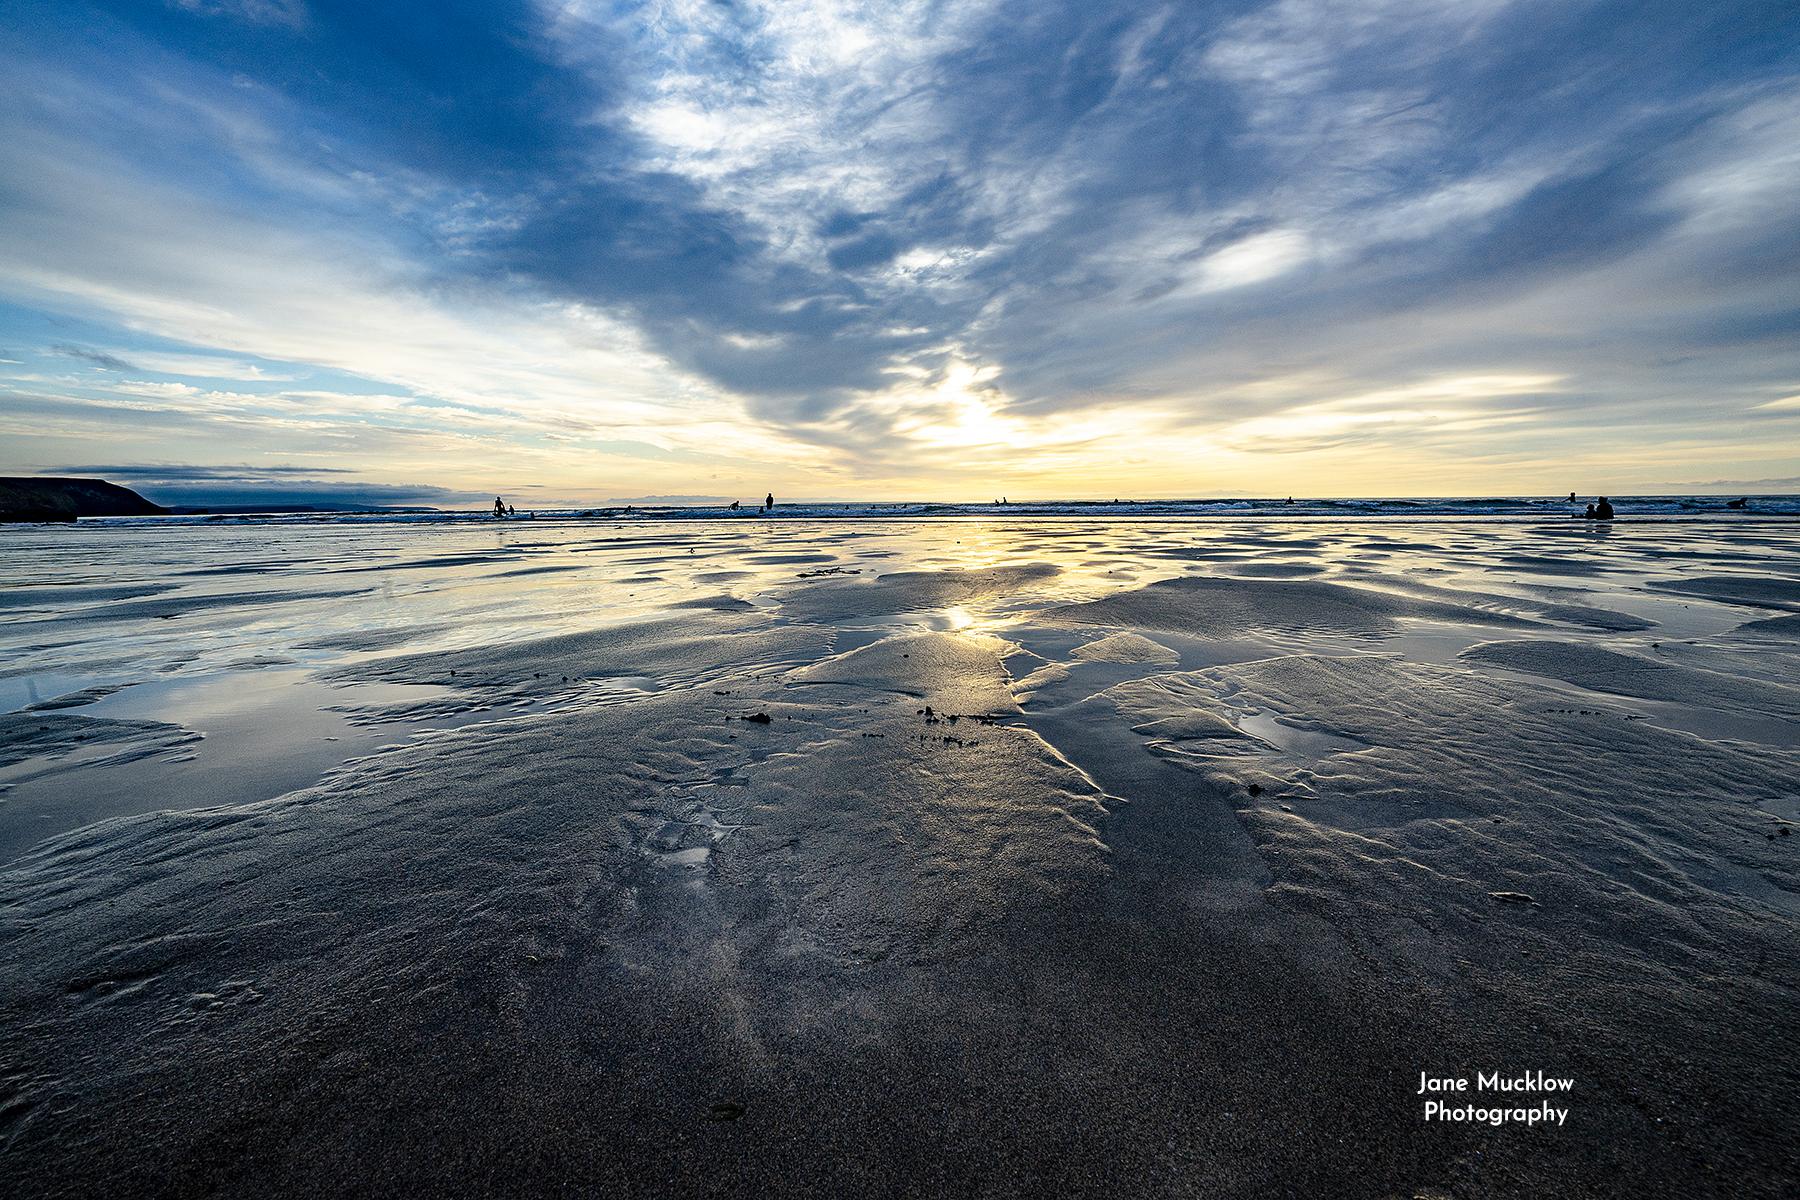 Photo of surfers at sunset Porthtowan Beach Cornwall by Jane Mucklow